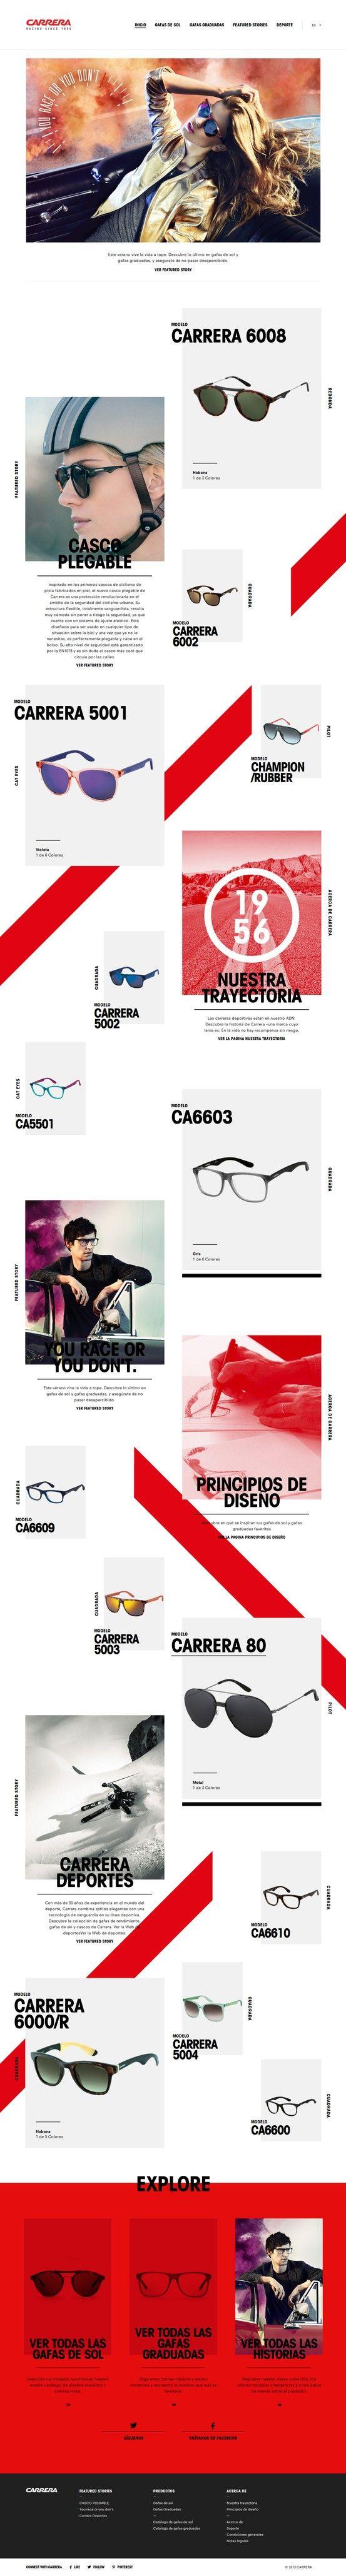 Carrera World Site of the Day 8 May 2013 http://www.awwwards.com/web-design-awards/carrera-world-1 #webdesign #inspiration #UI #Clean #ResponsiveDesign #Trend #Design #Black #White #Red